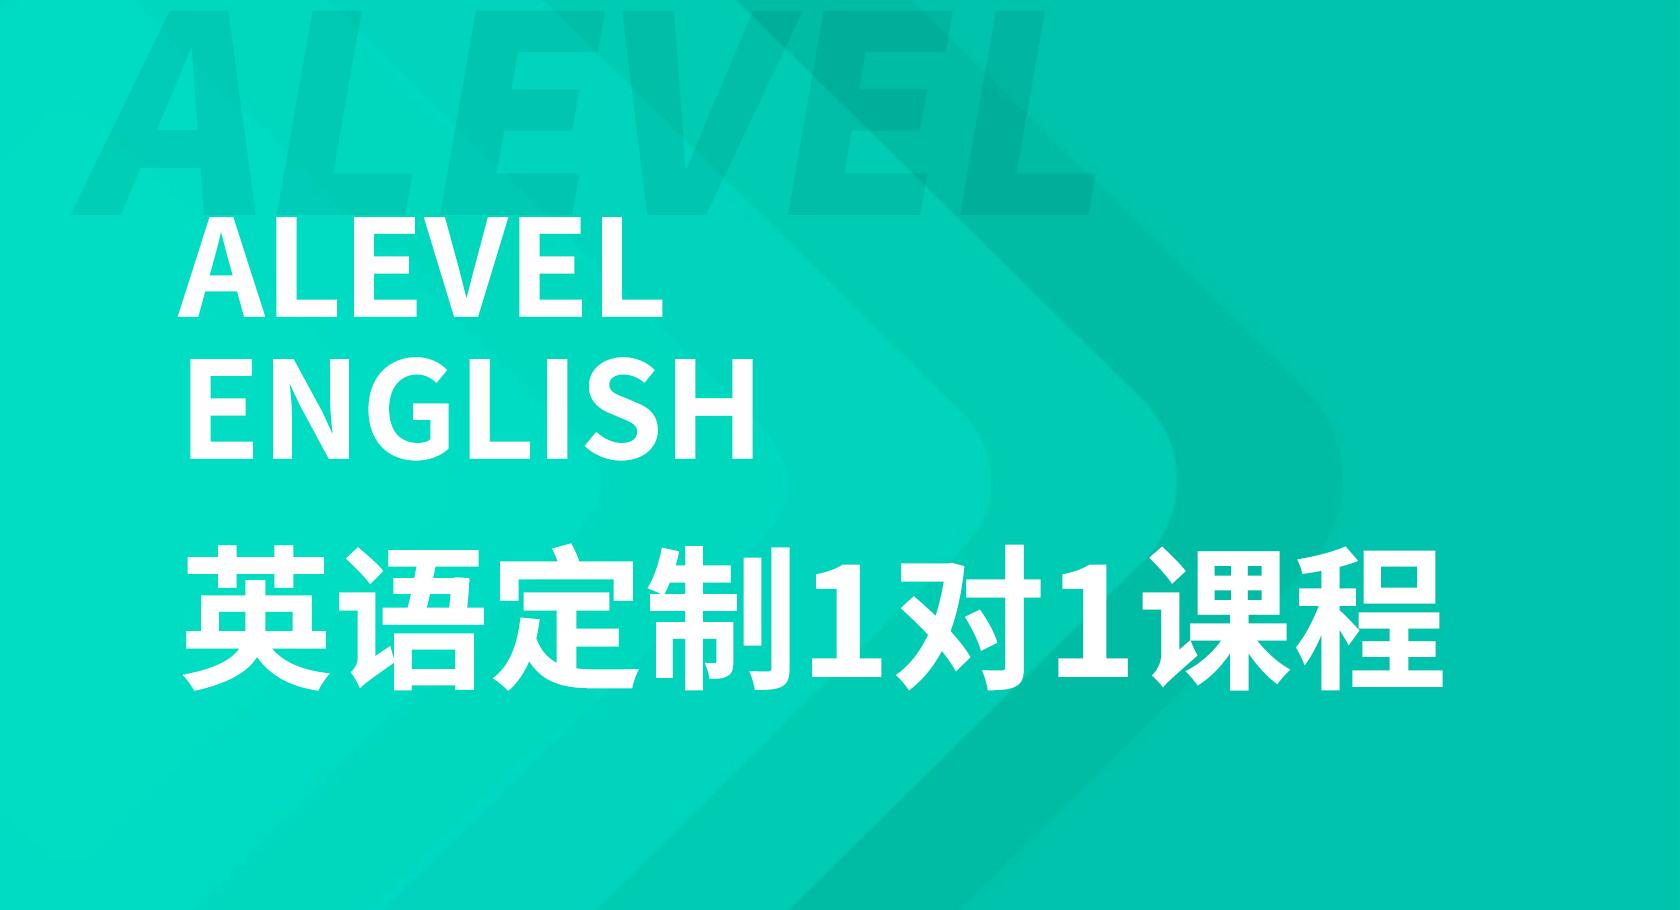 Alevel英语1对1课程